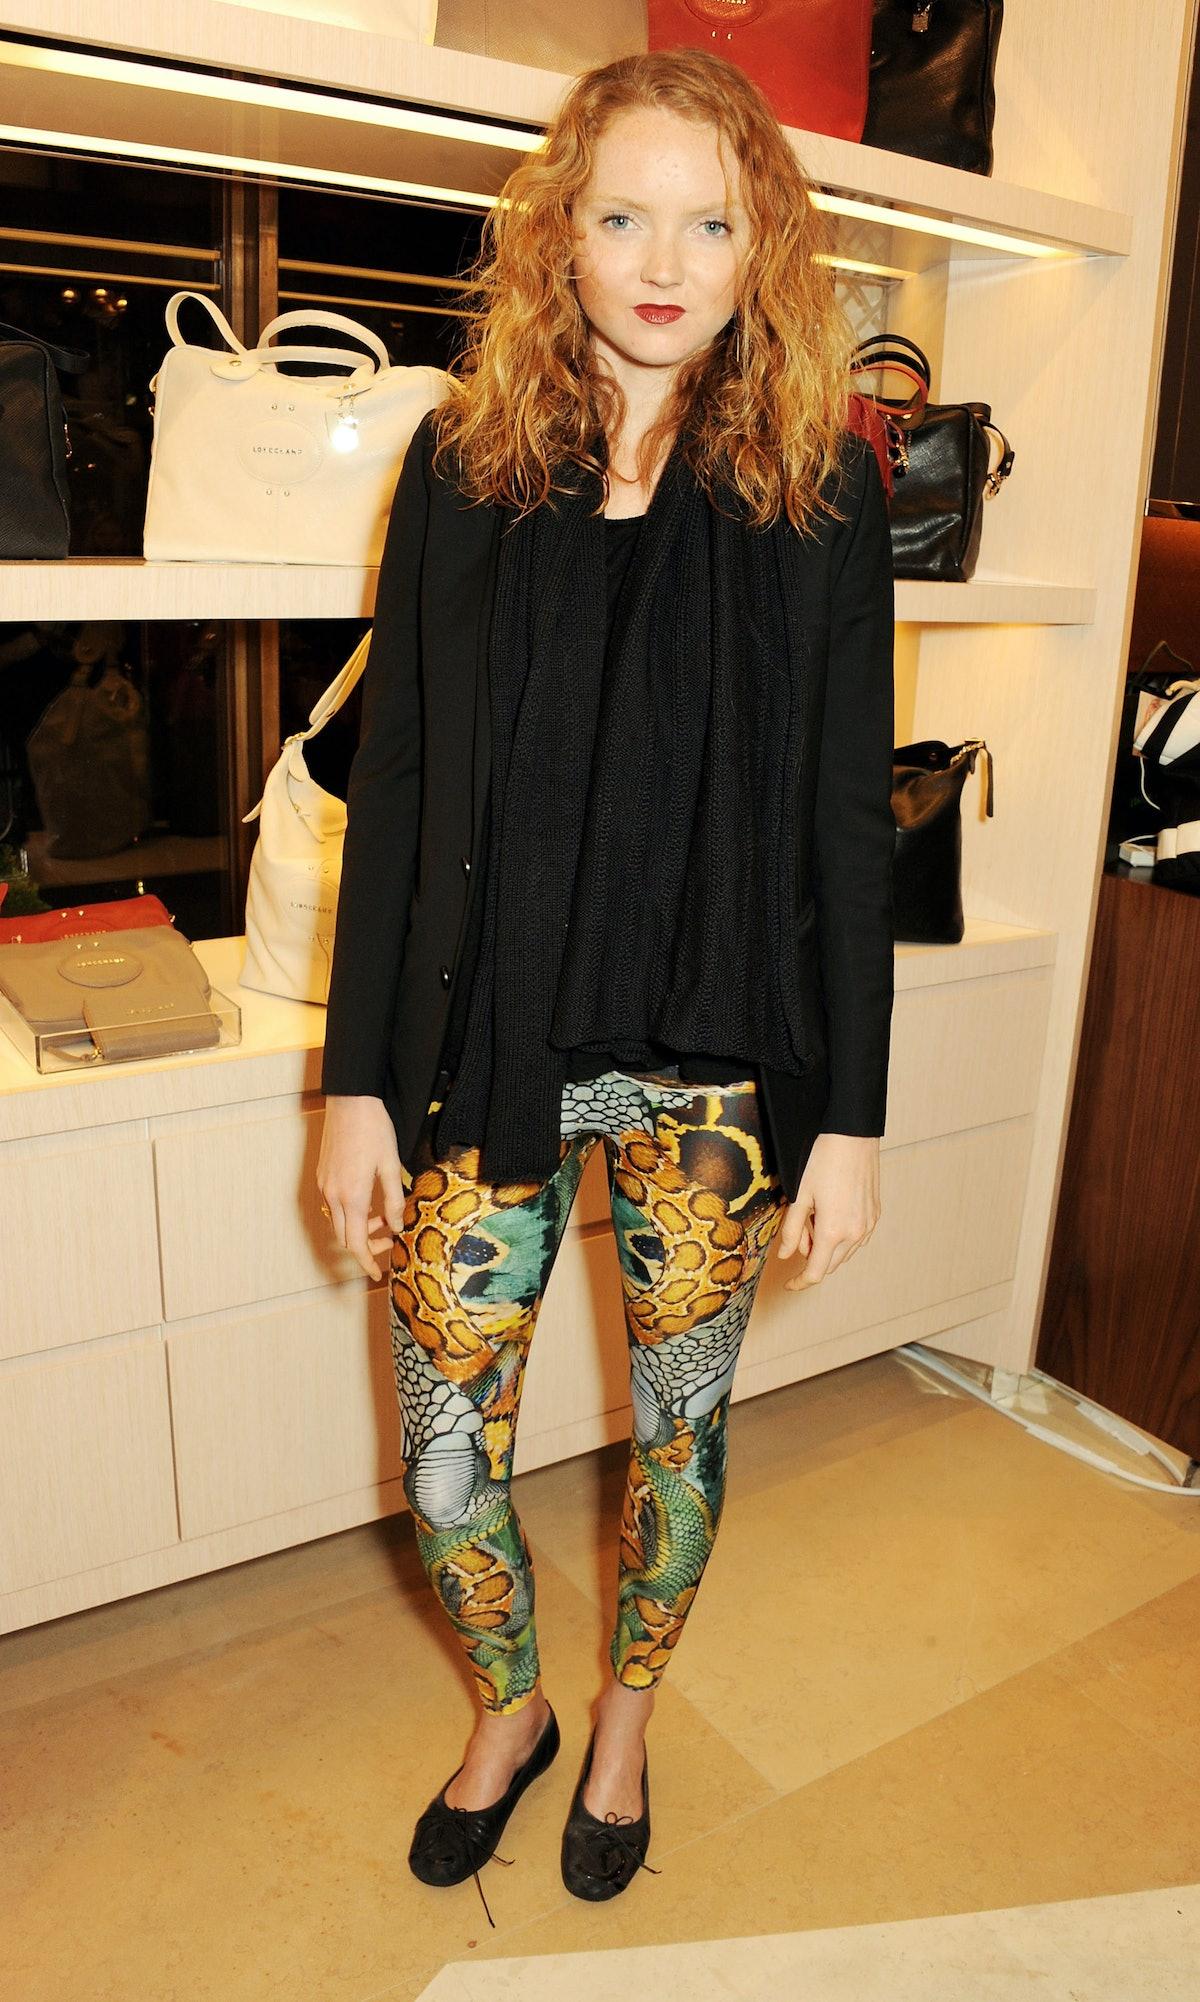 lonchamp-store-opening-london-fashion-week-Lily-Cole